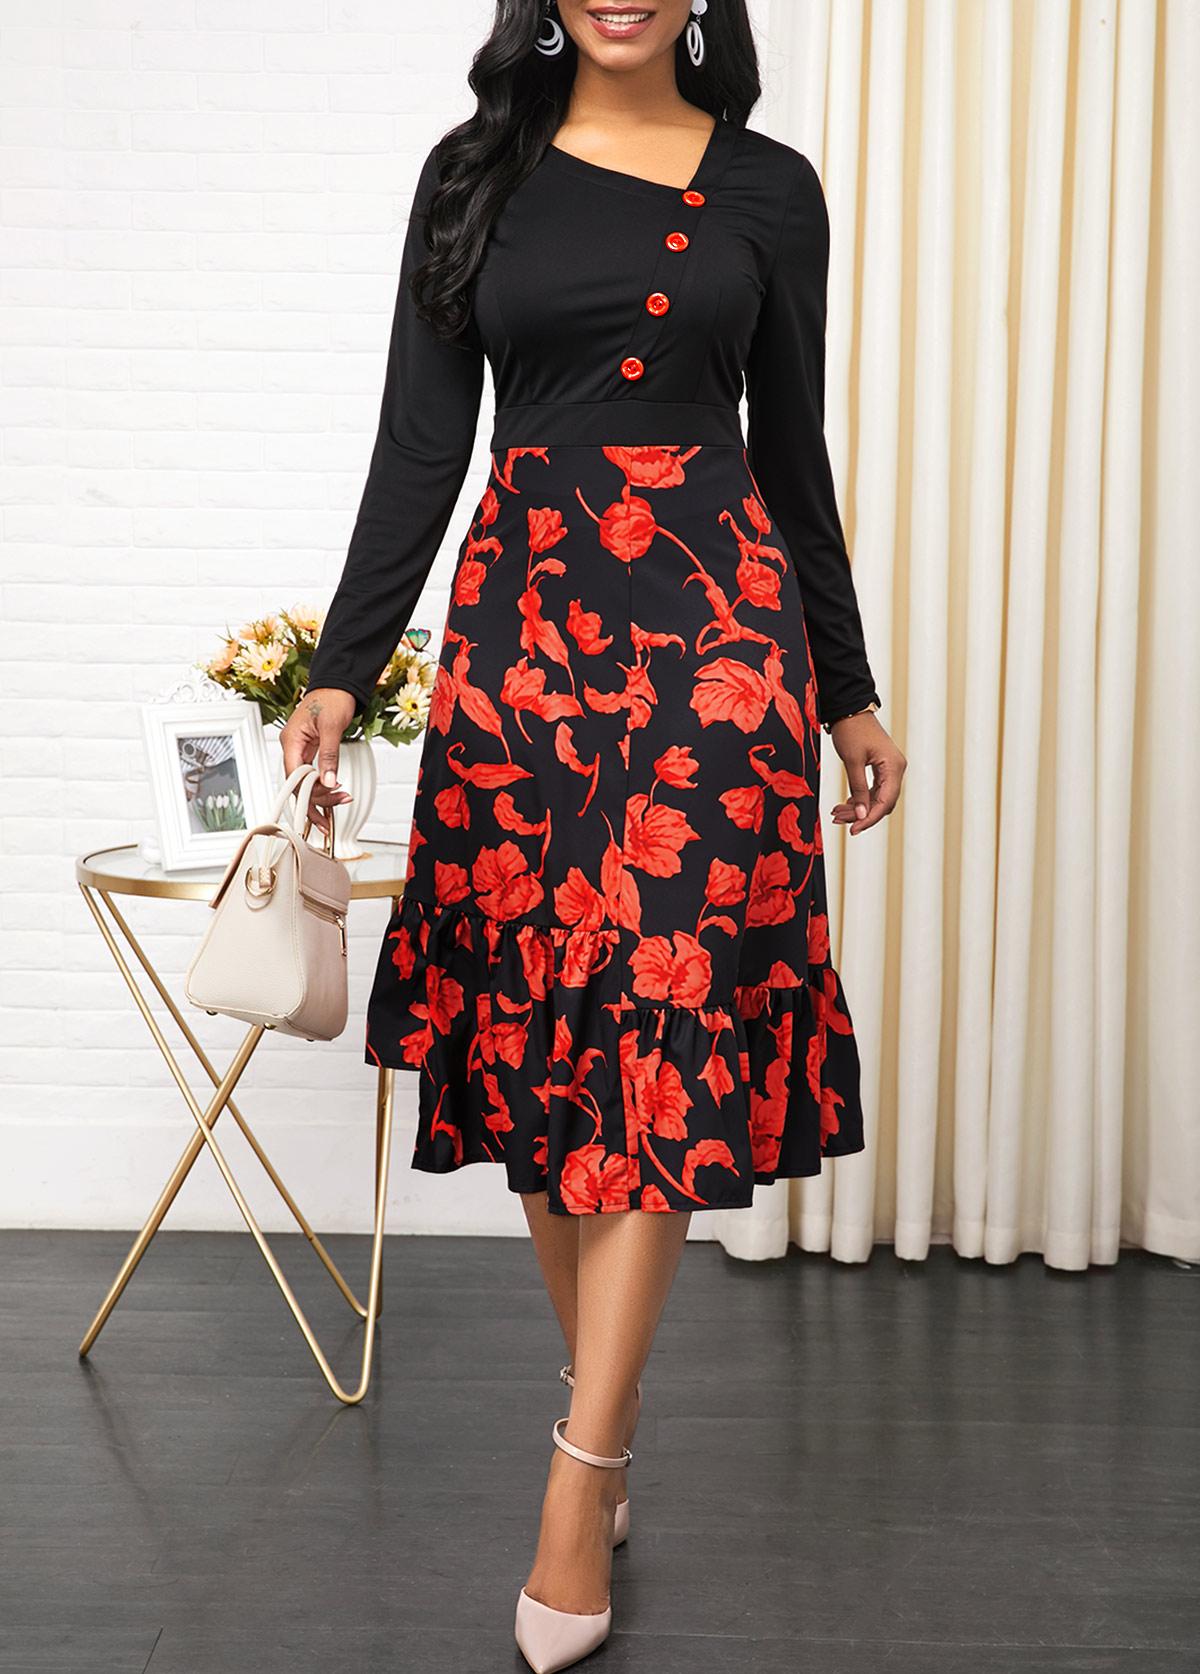 Floral Print Side Zipper Button Detail Dress